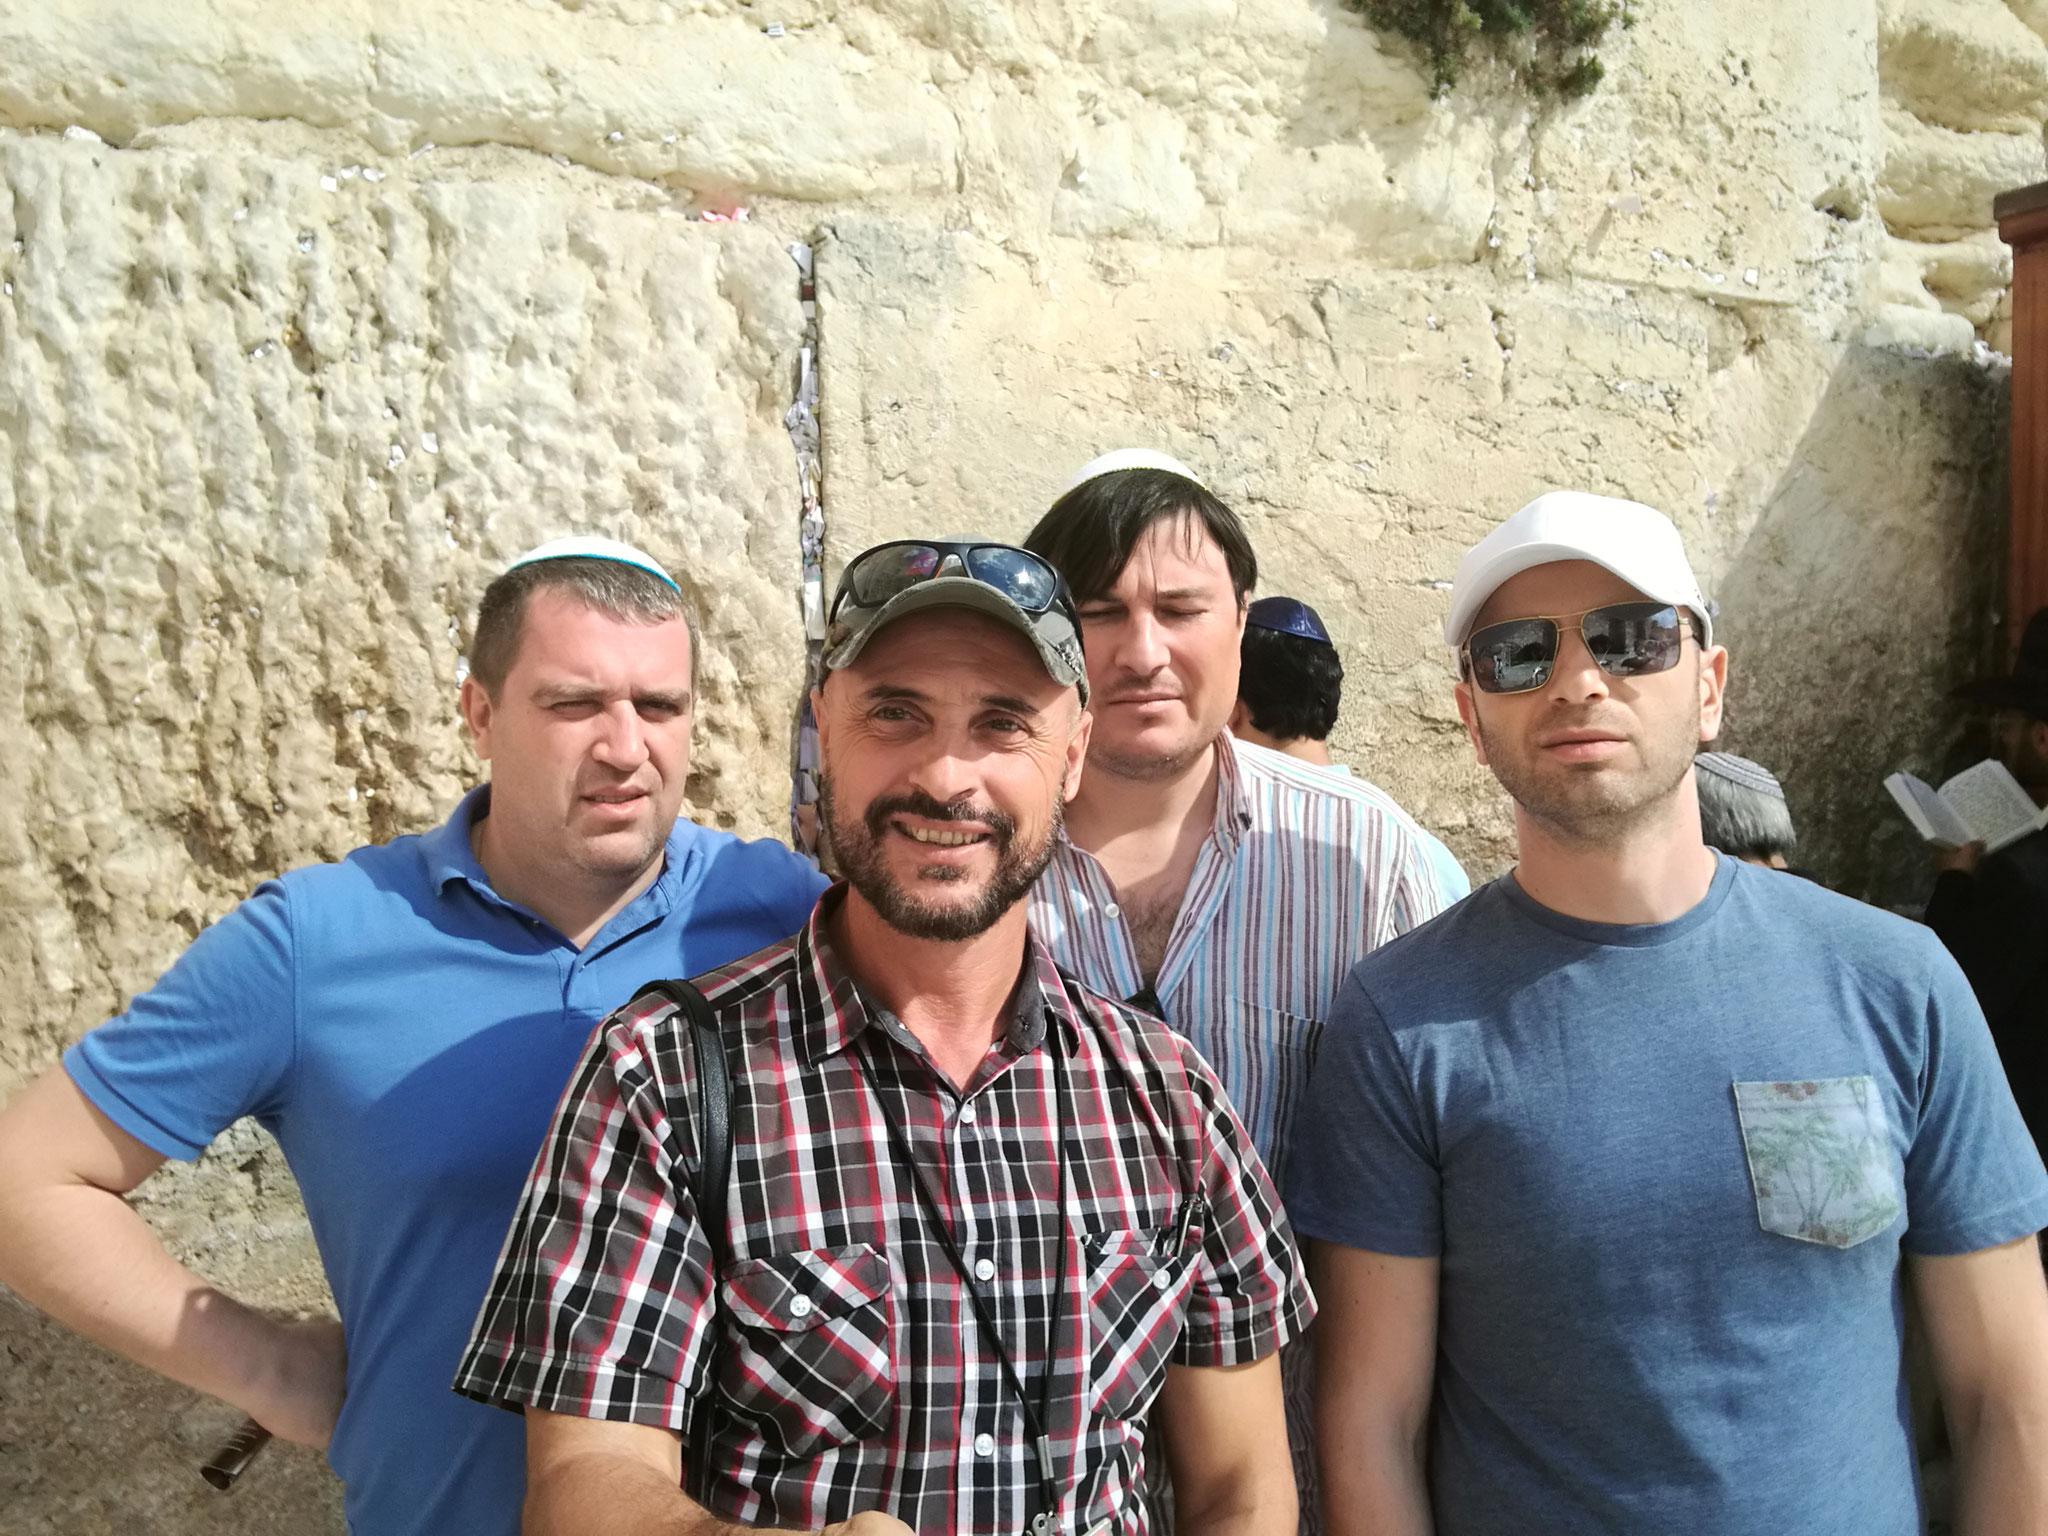 Ukrainian Jewish tourists at the Western Wall